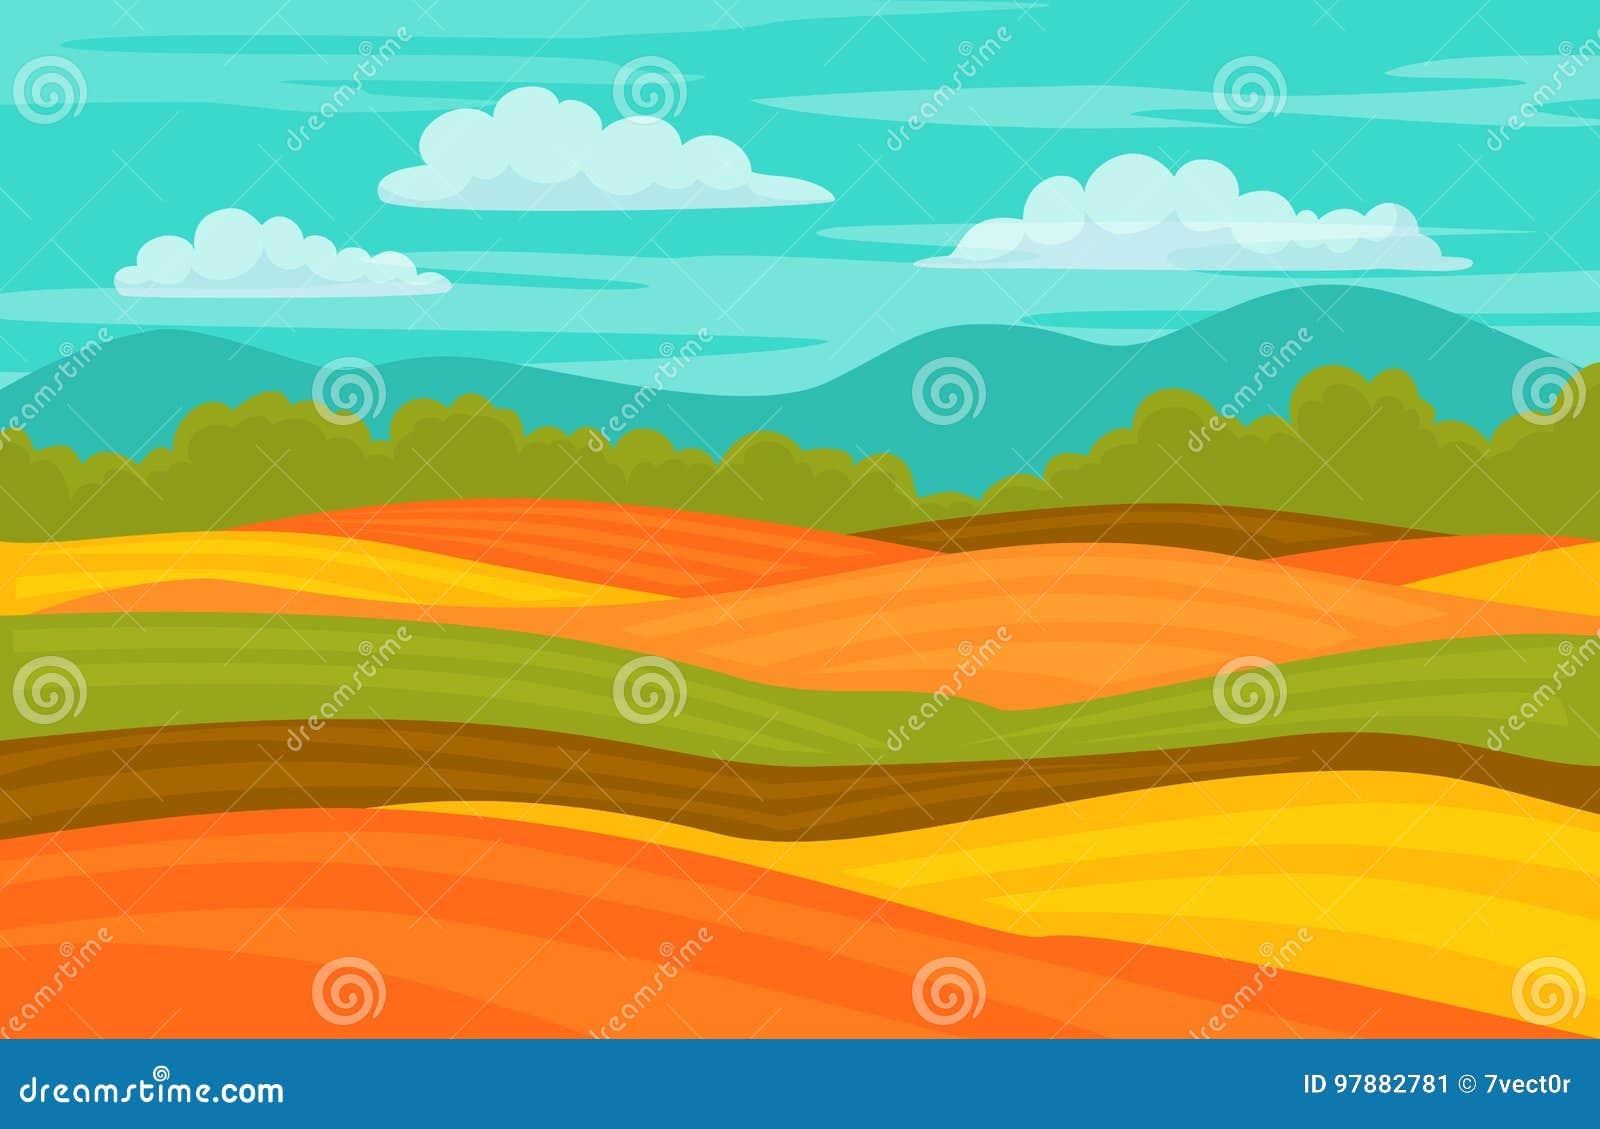 Autumn fall colorful cute fields landscape background